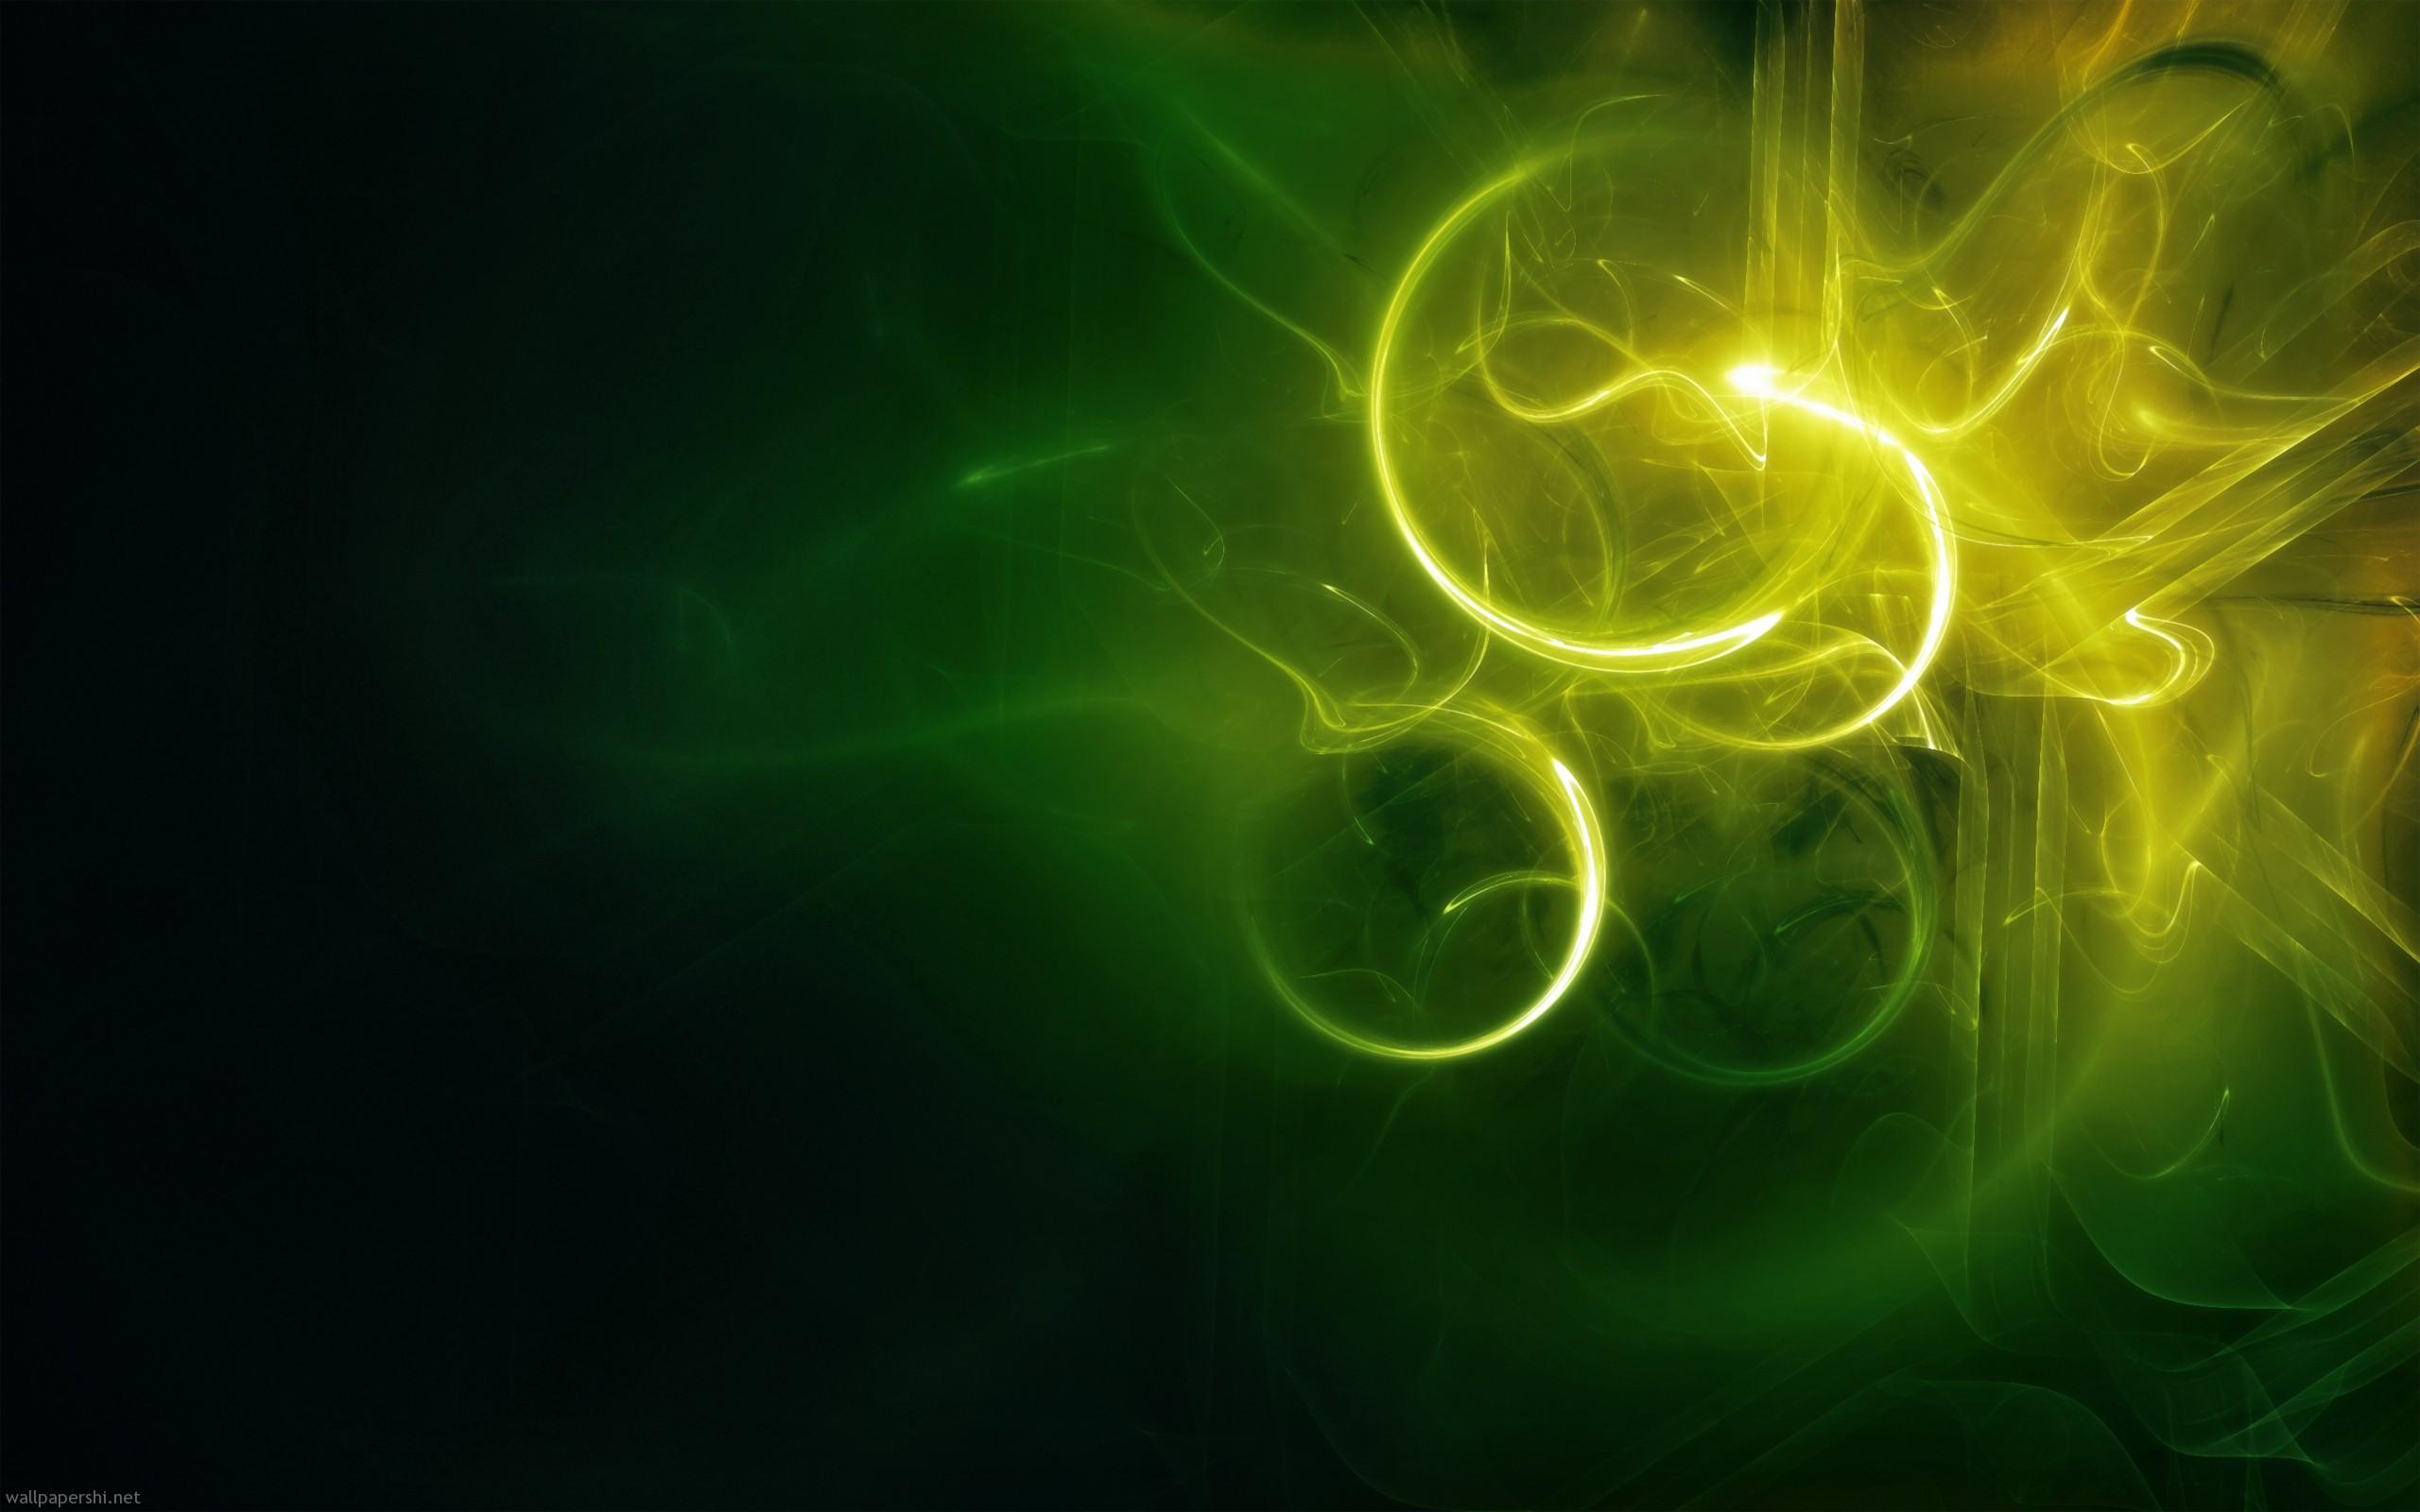 Abstract yellow green drawing